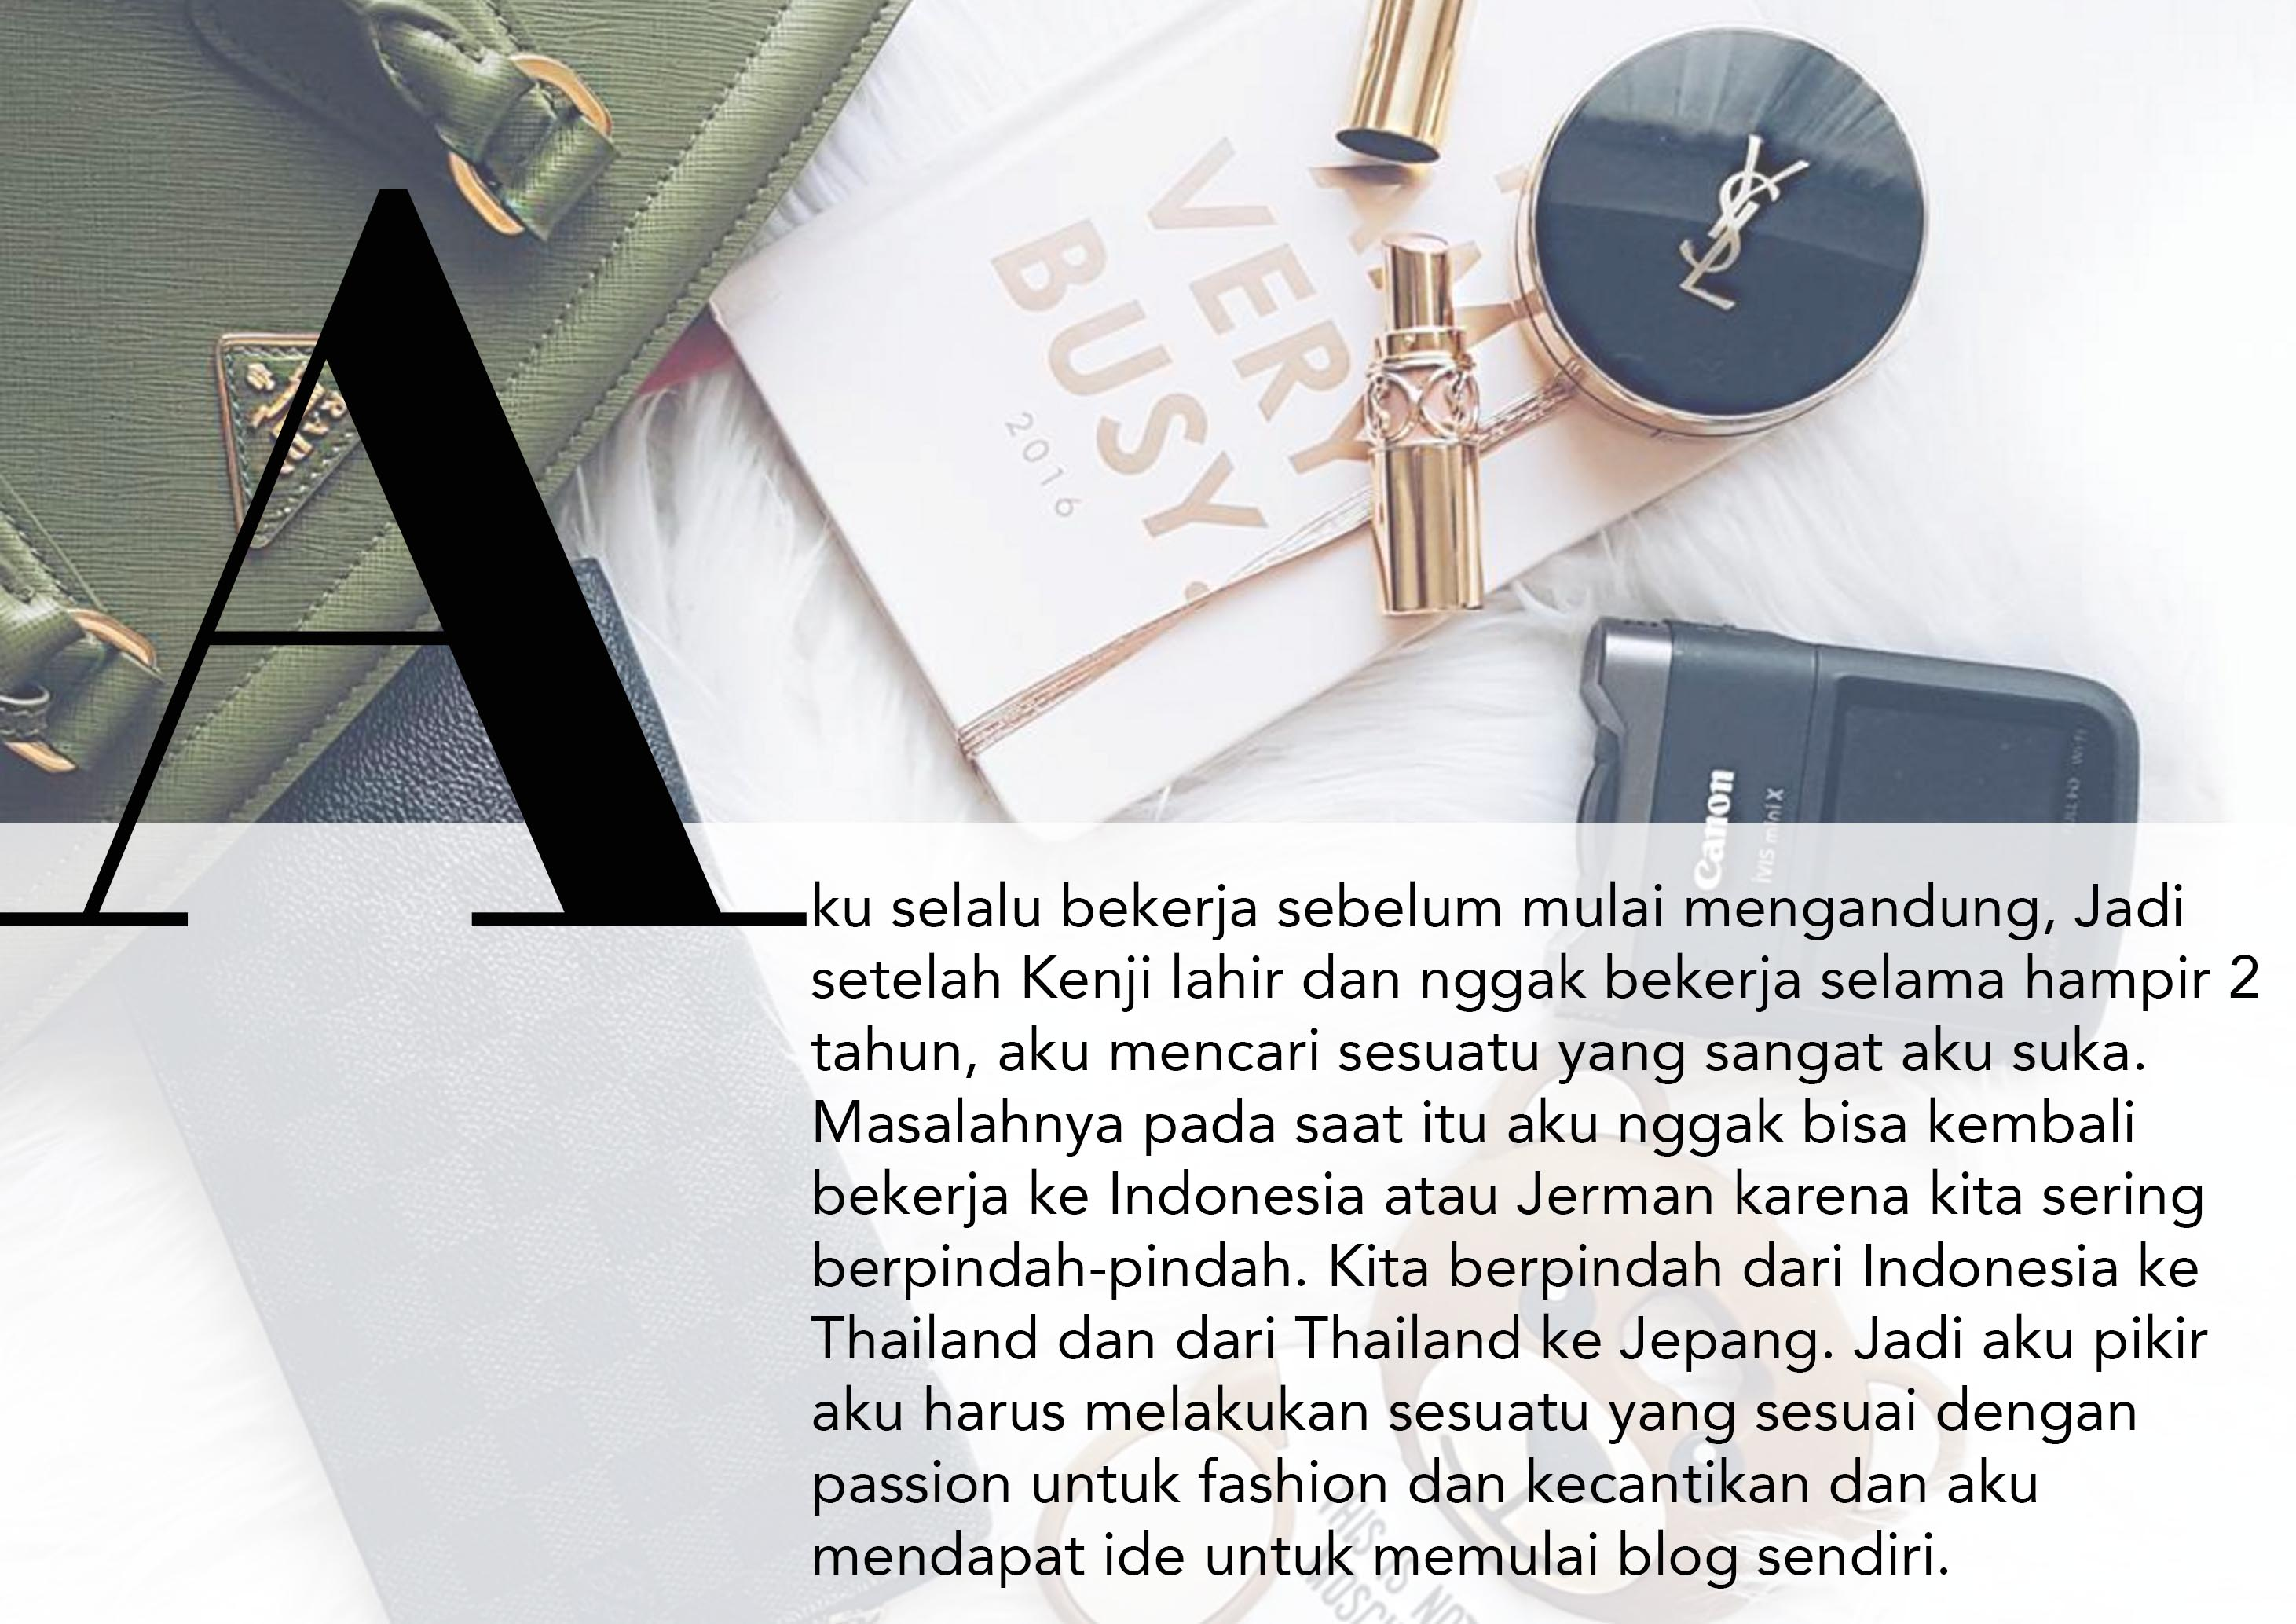 9 Fakta tentang  Jennifer Bachdim, Supermom Fashion Blogger yang Berhasil Meraih Sukses